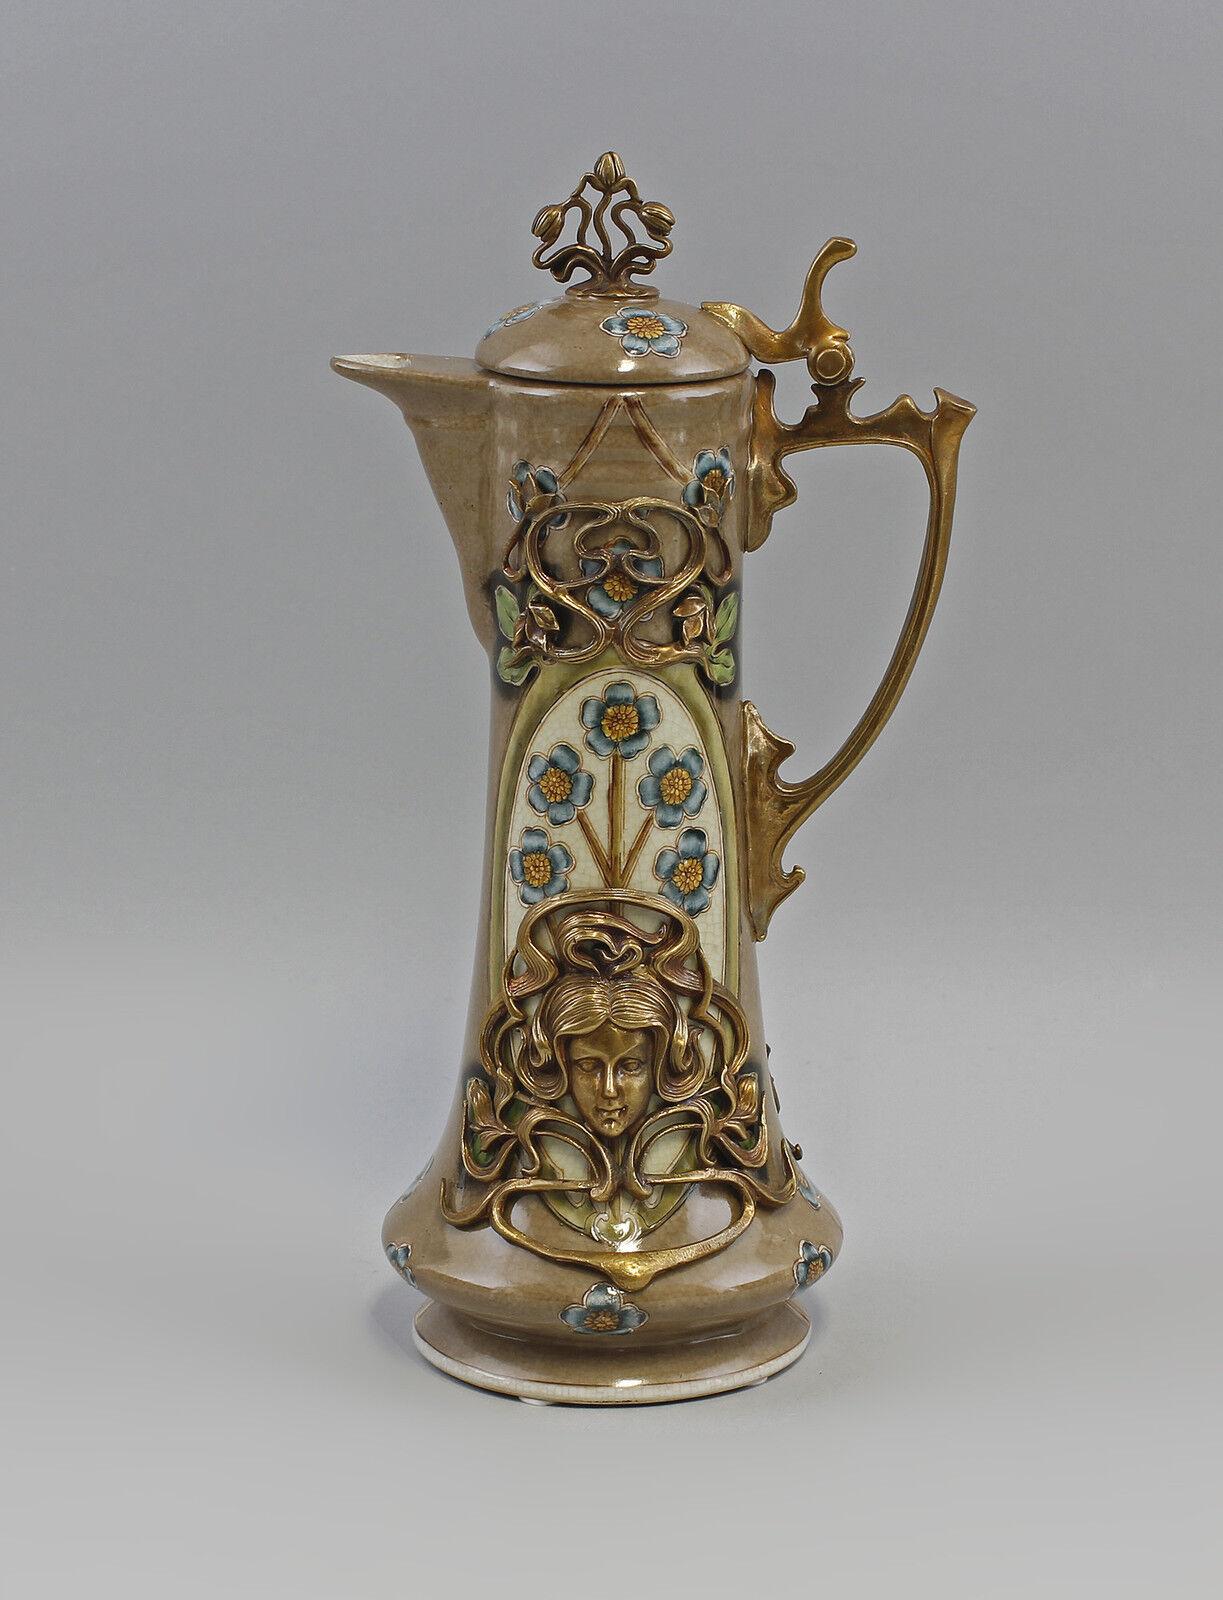 Bronzo Ceramica Brocca Stile Liberty Nuovo 9973073 -  - ebay.it